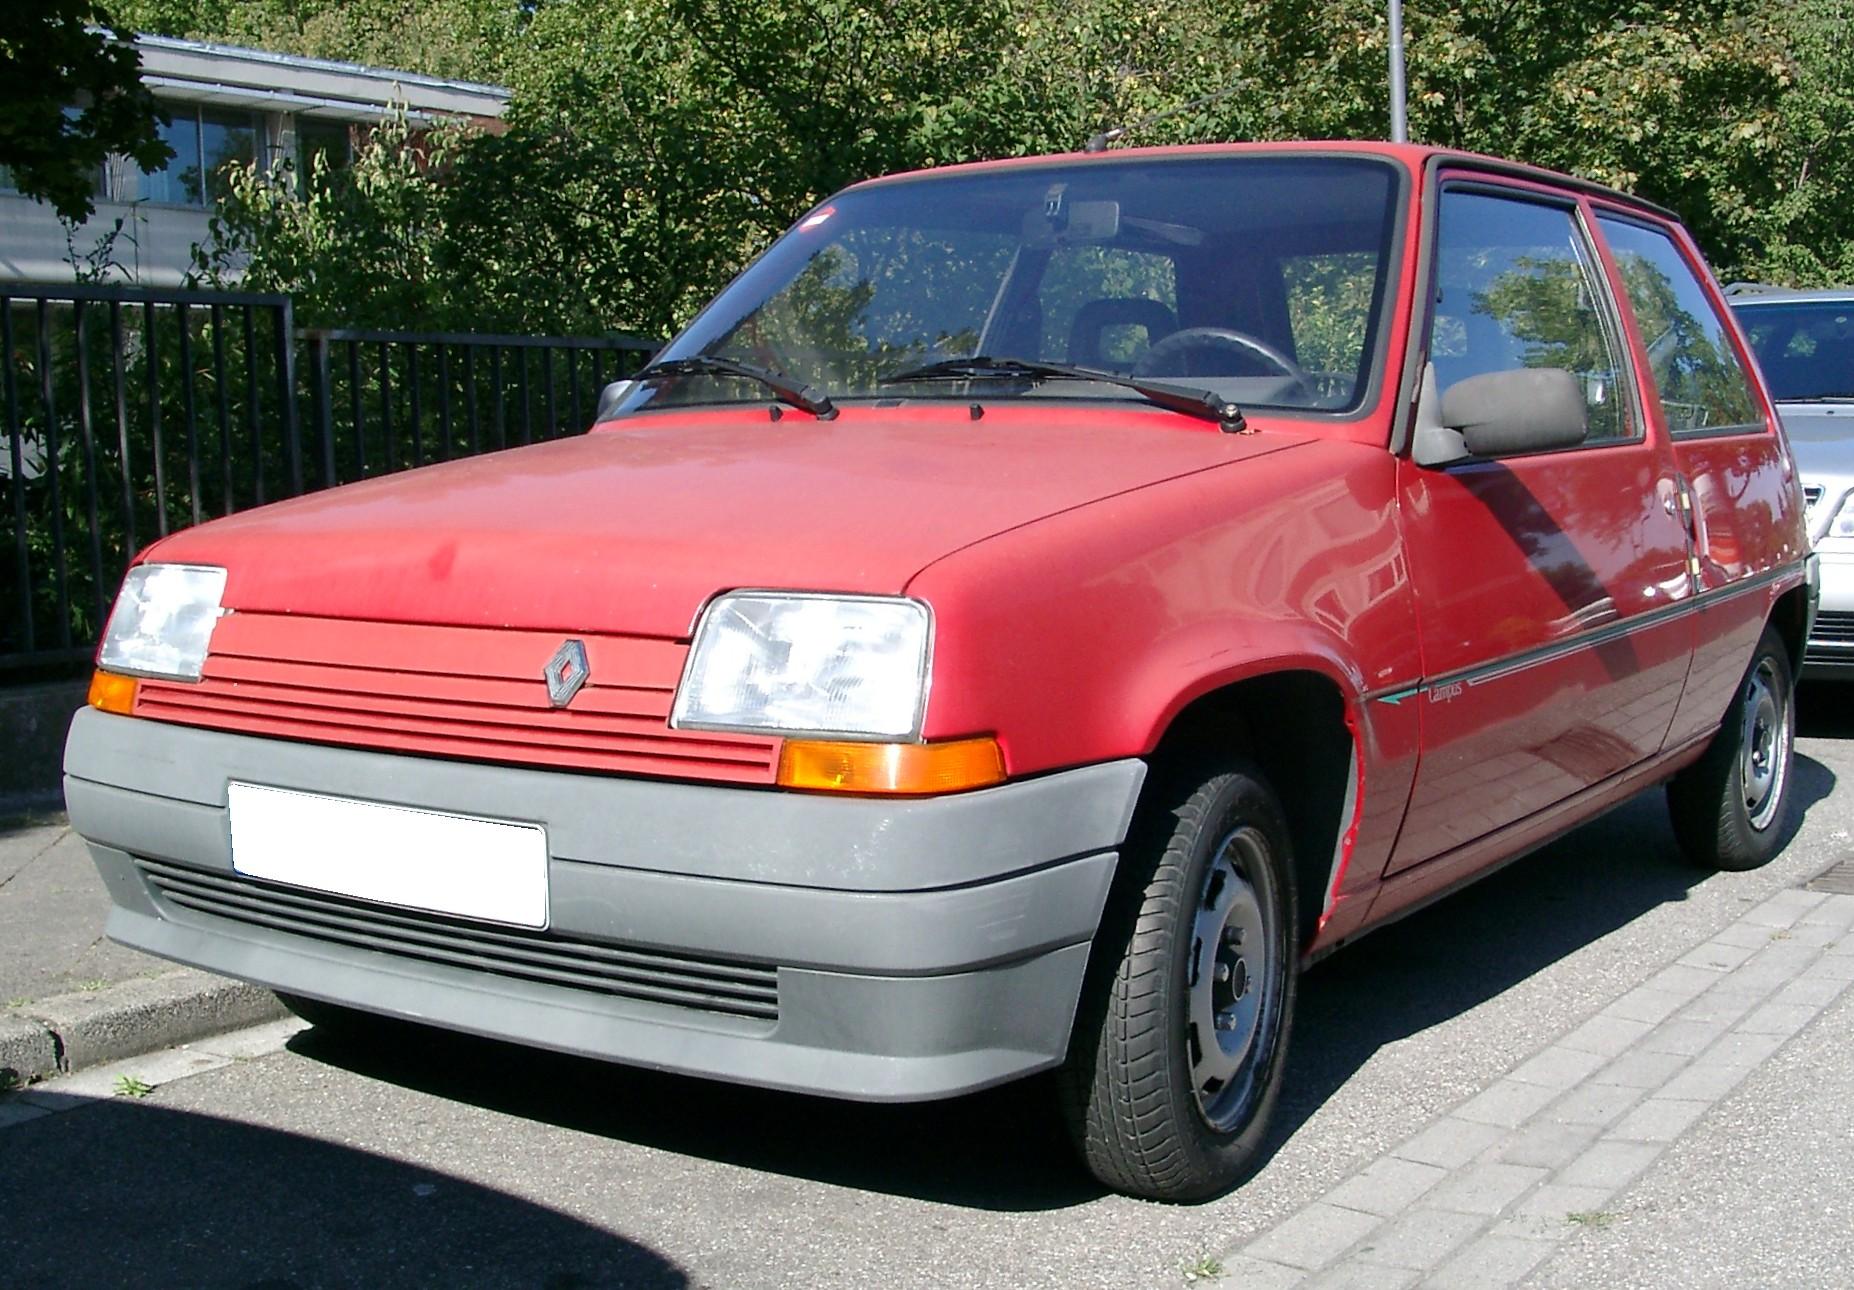 Renault 5 - Tractor